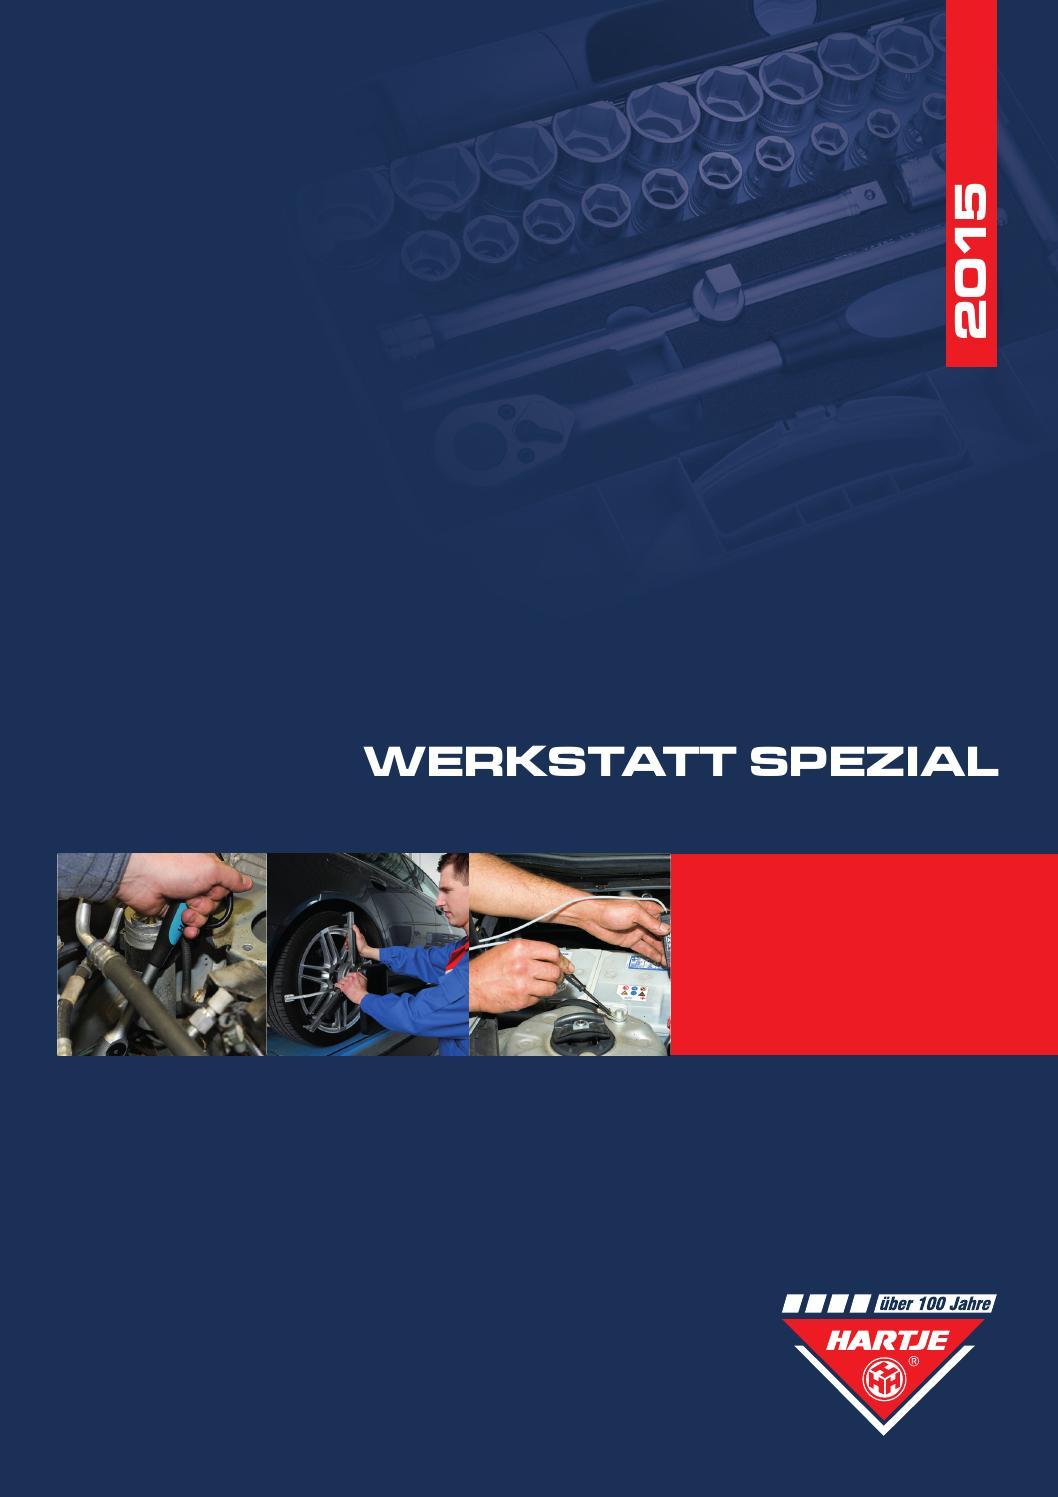 SW 6-32 mm in Wickeltasche 10//12T Doppel-Ringschlüsselsatz DIN 838 Condor